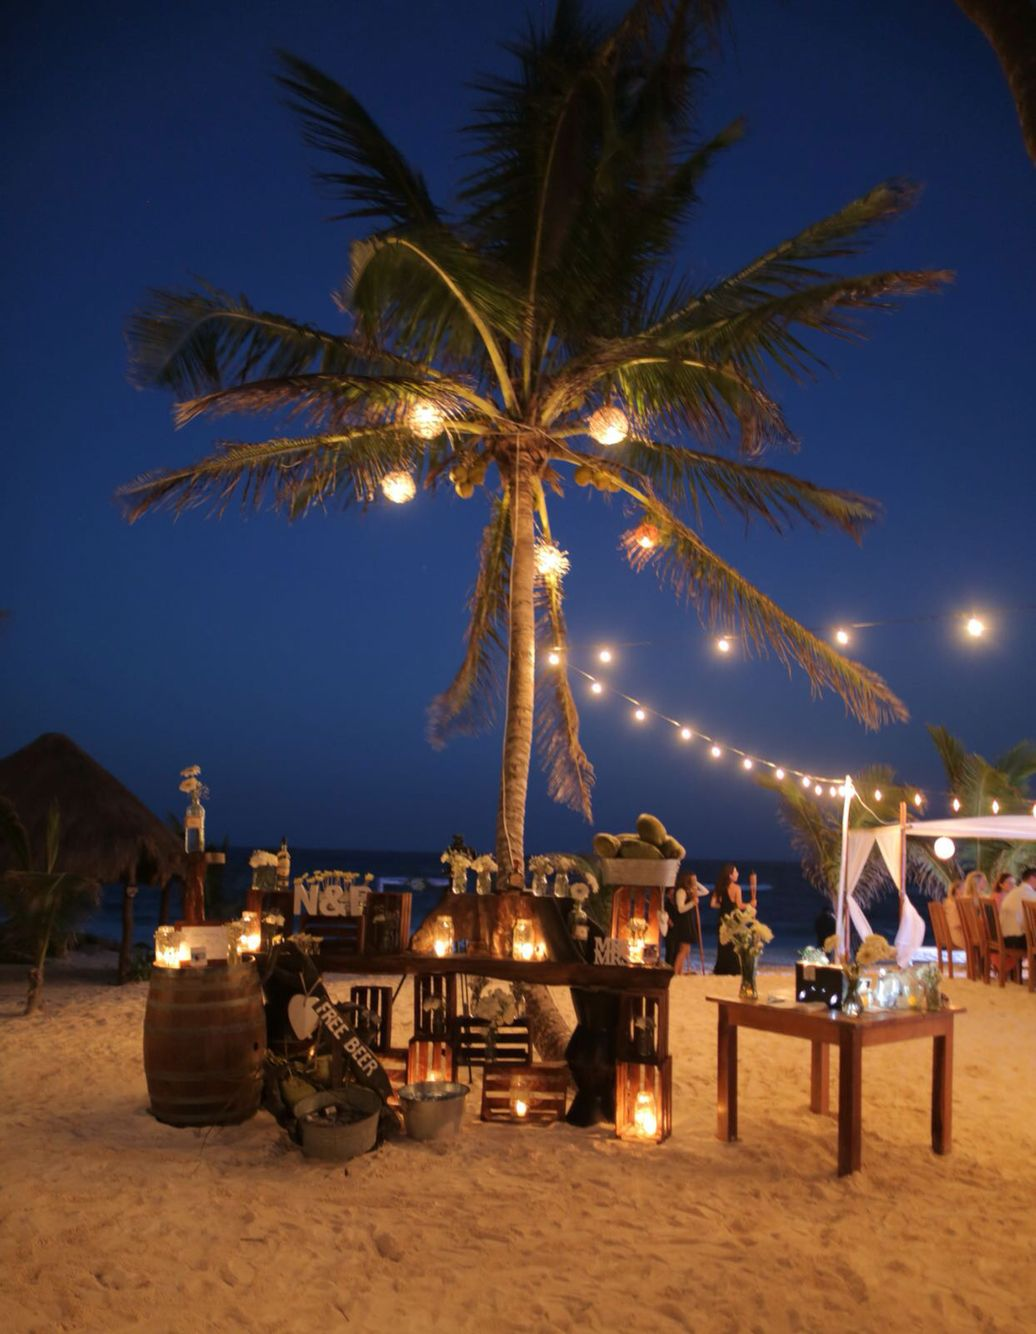 Tequilia Bar For Our Wedding At Akiin Beach Club Tulum